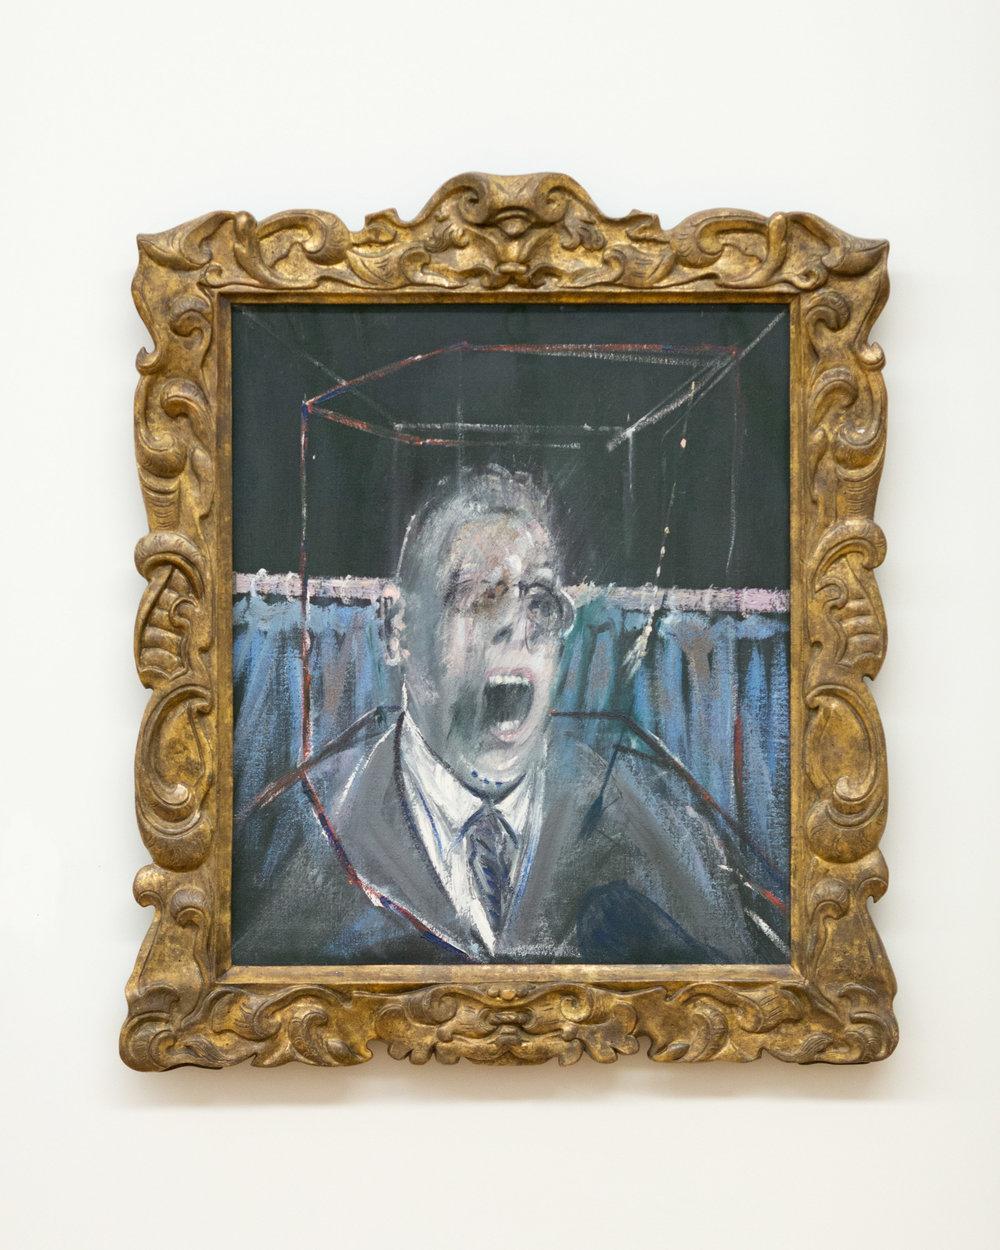 Francis Bacon's having a bad day